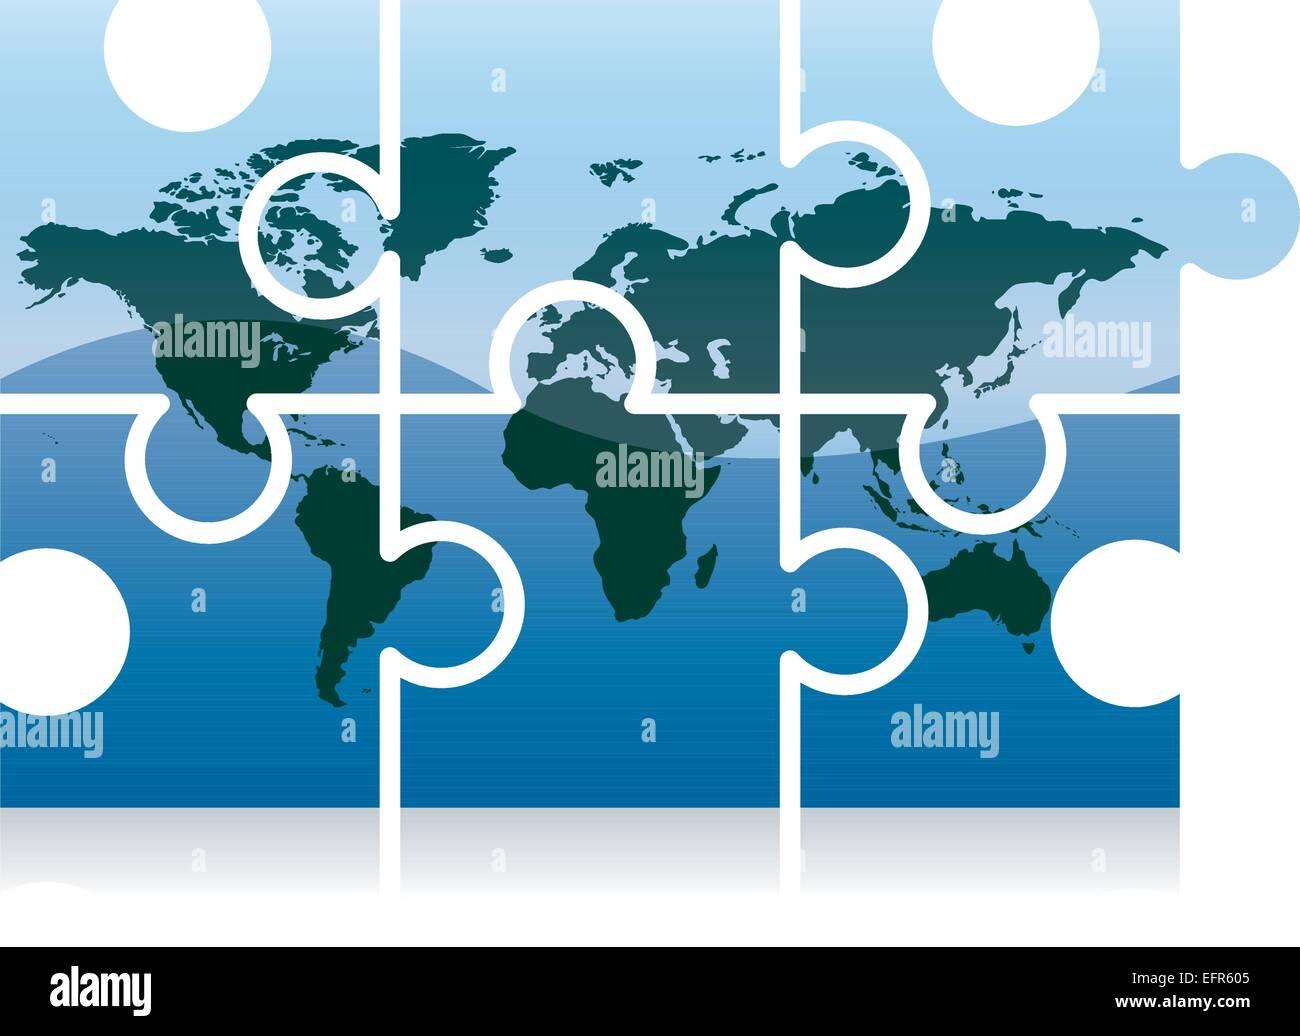 Shiny jigsaw world map puzzle icon vector illustration stock vector shiny jigsaw world map puzzle icon vector illustration gumiabroncs Images